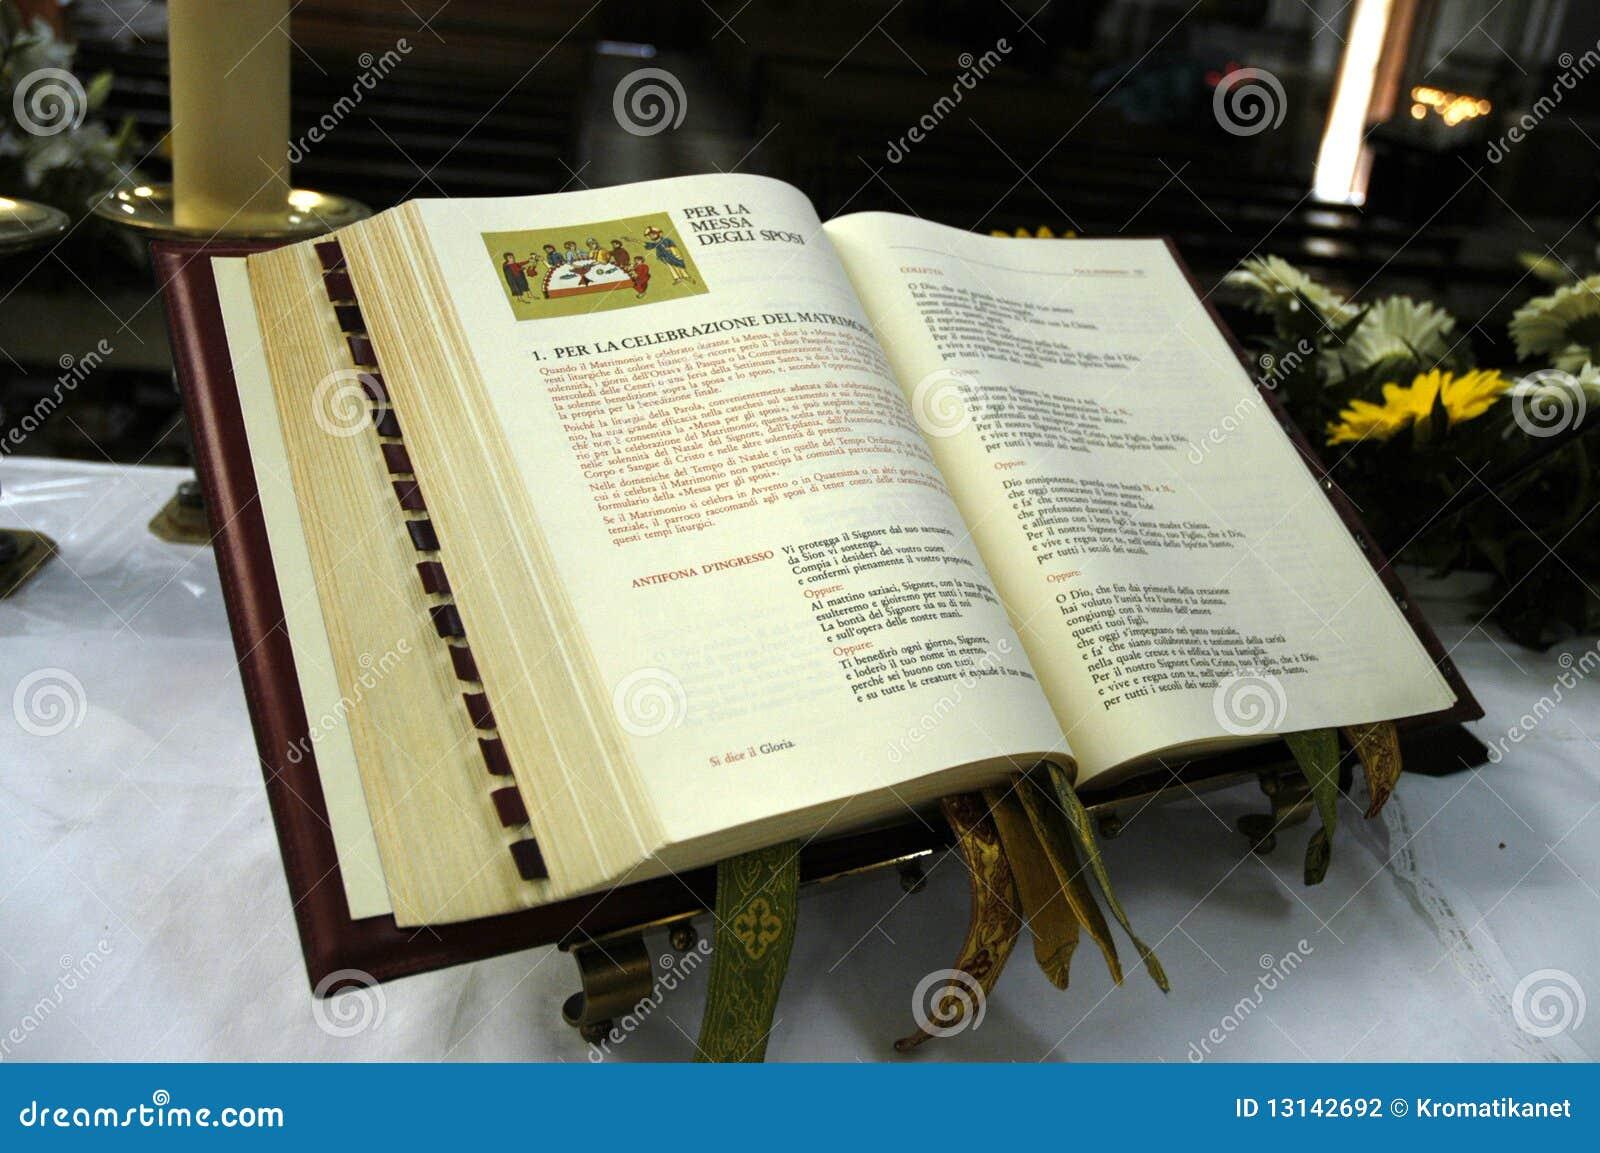 Auguri Matrimonio Vangelo : Chiesa del vangelo fotografia stock immagine di nozze